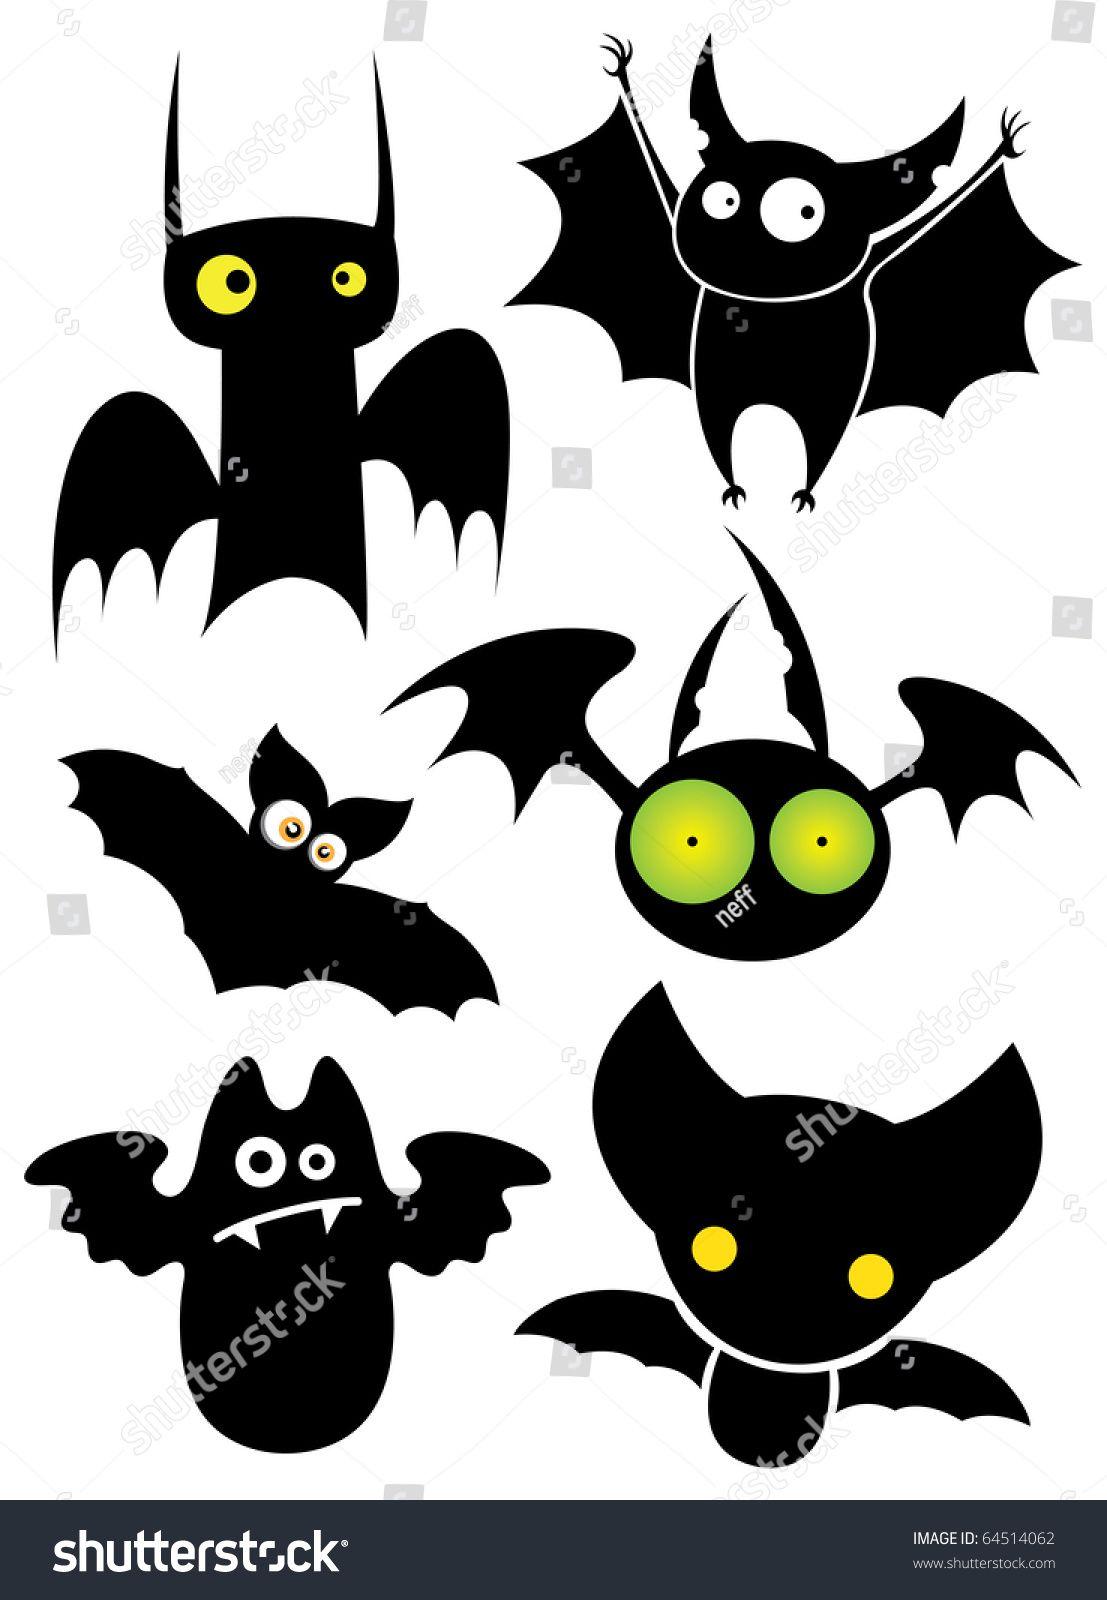 Printable halloween bats - Set Of Cartoon Halloween Black Bats Vector Illustration